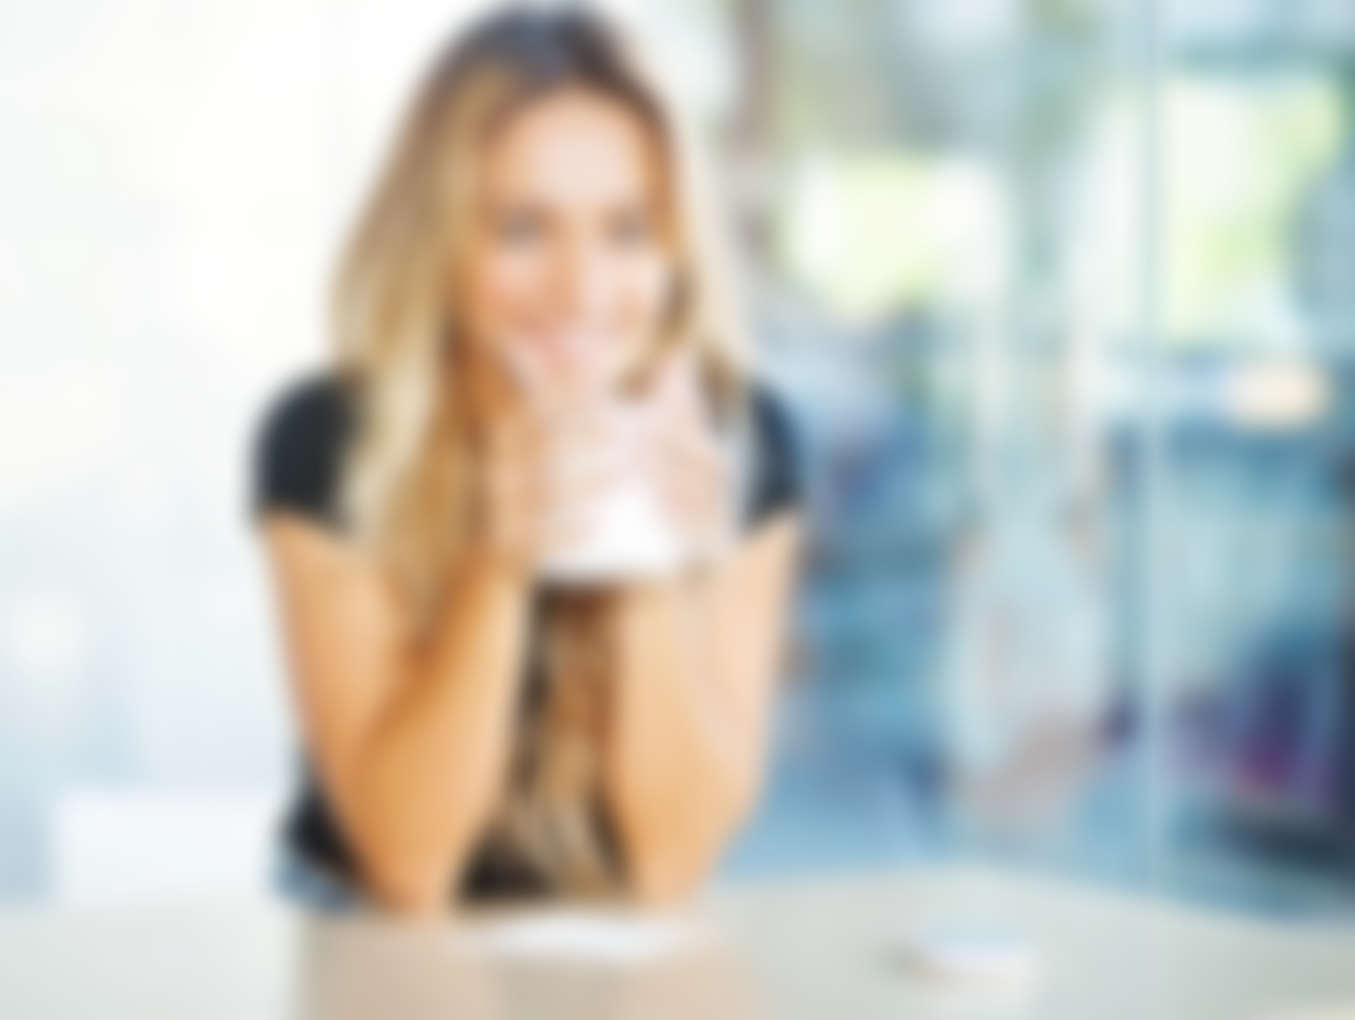 6 Behaviors That Make People Like You More